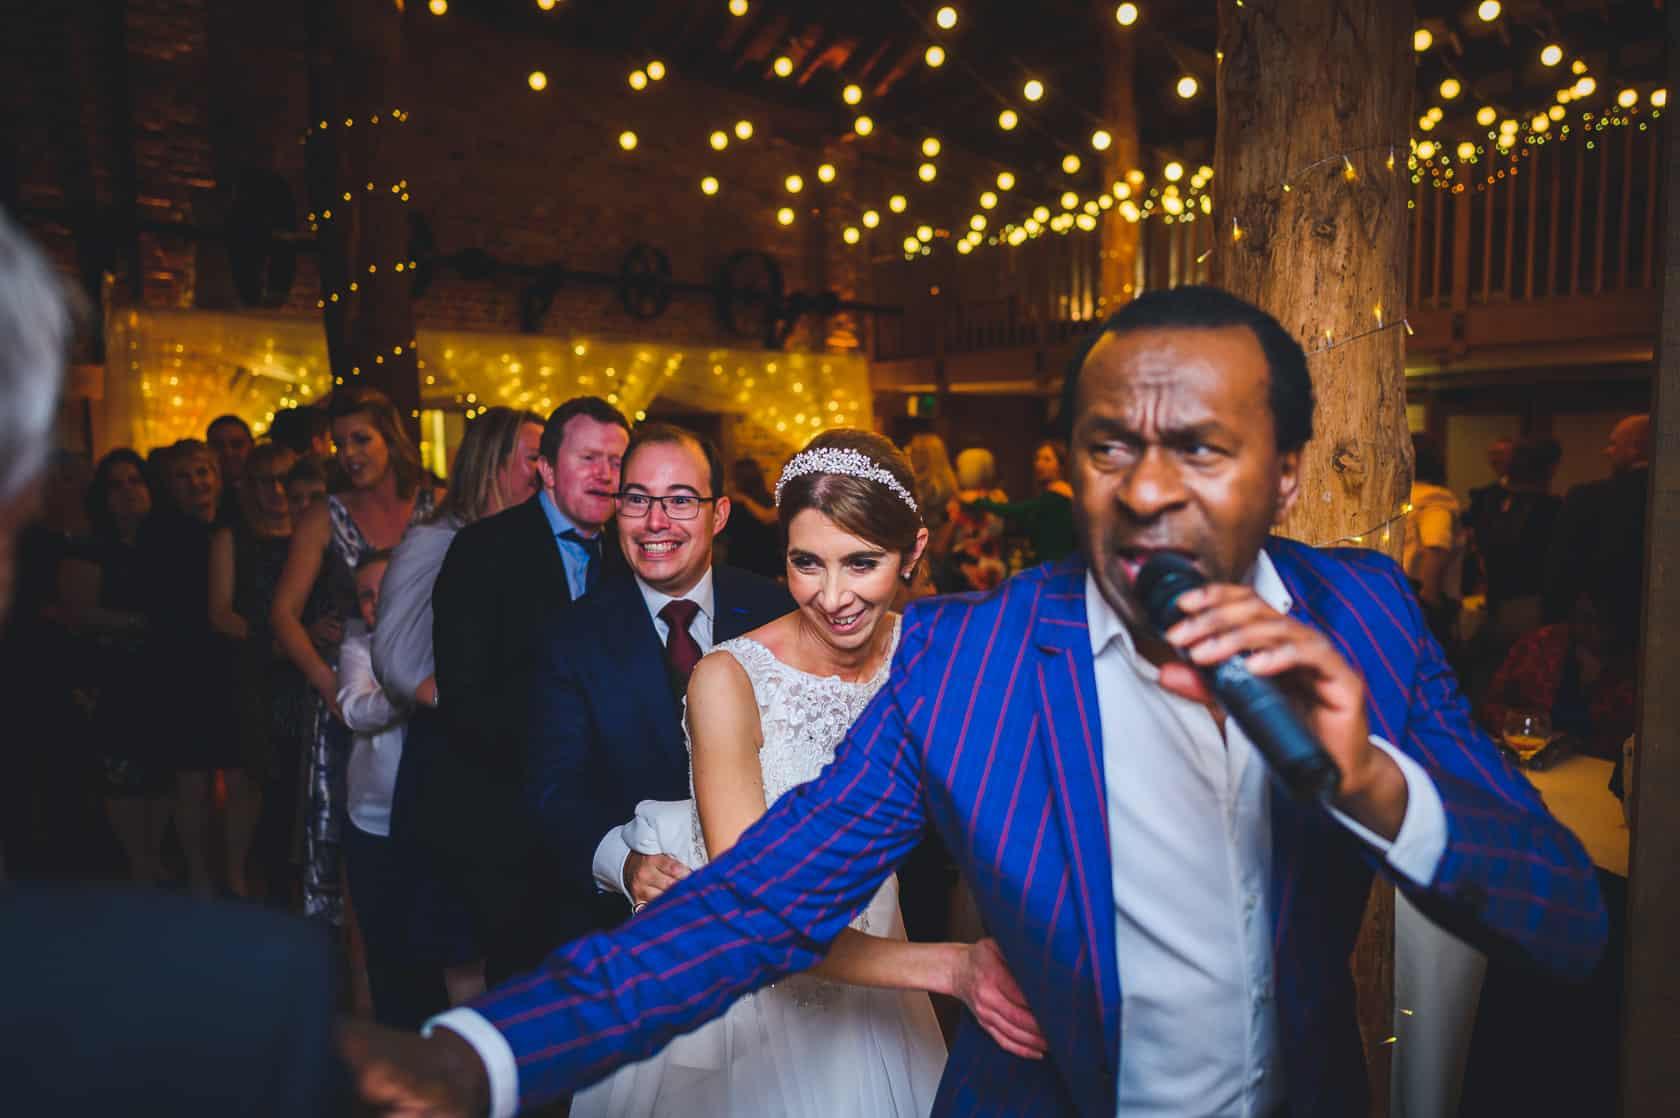 Best_Wedding_Photography_2019_Wedding-Photographer-Essex_118